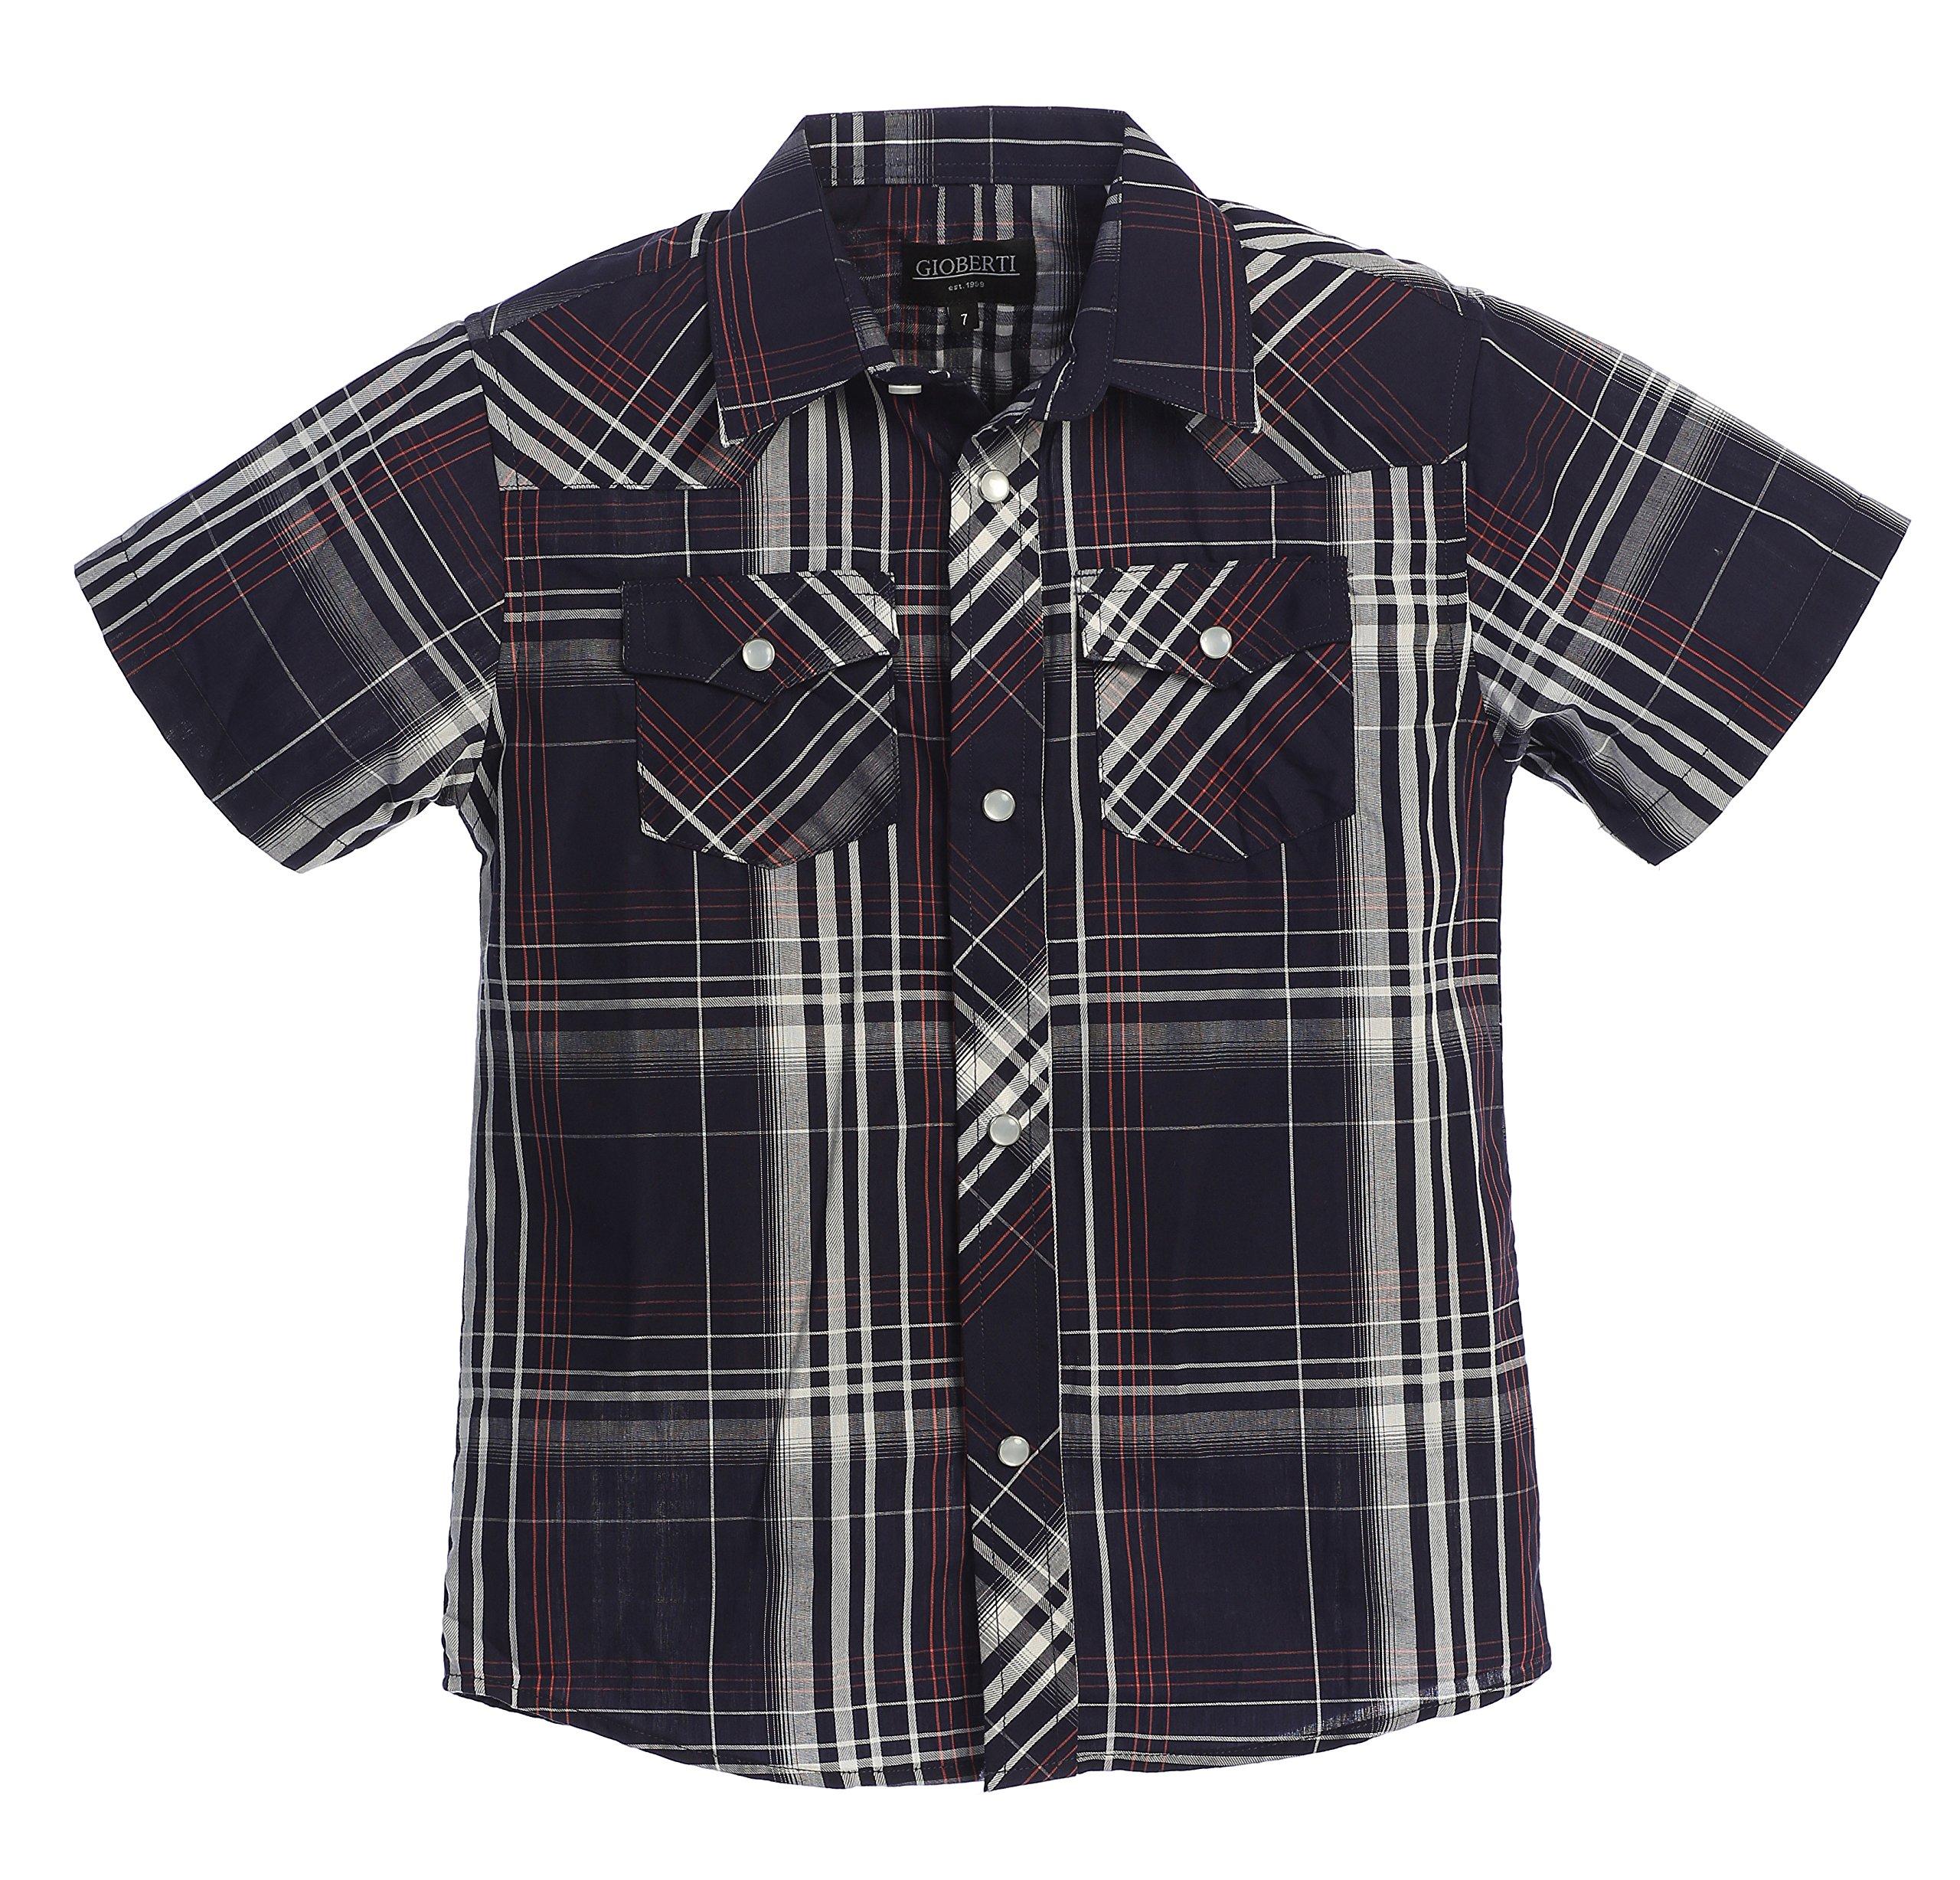 bebabc6a39a5c Gioberti Boys Casual Western Plaid Pearl Snap Short Sleeve Shirt product  image